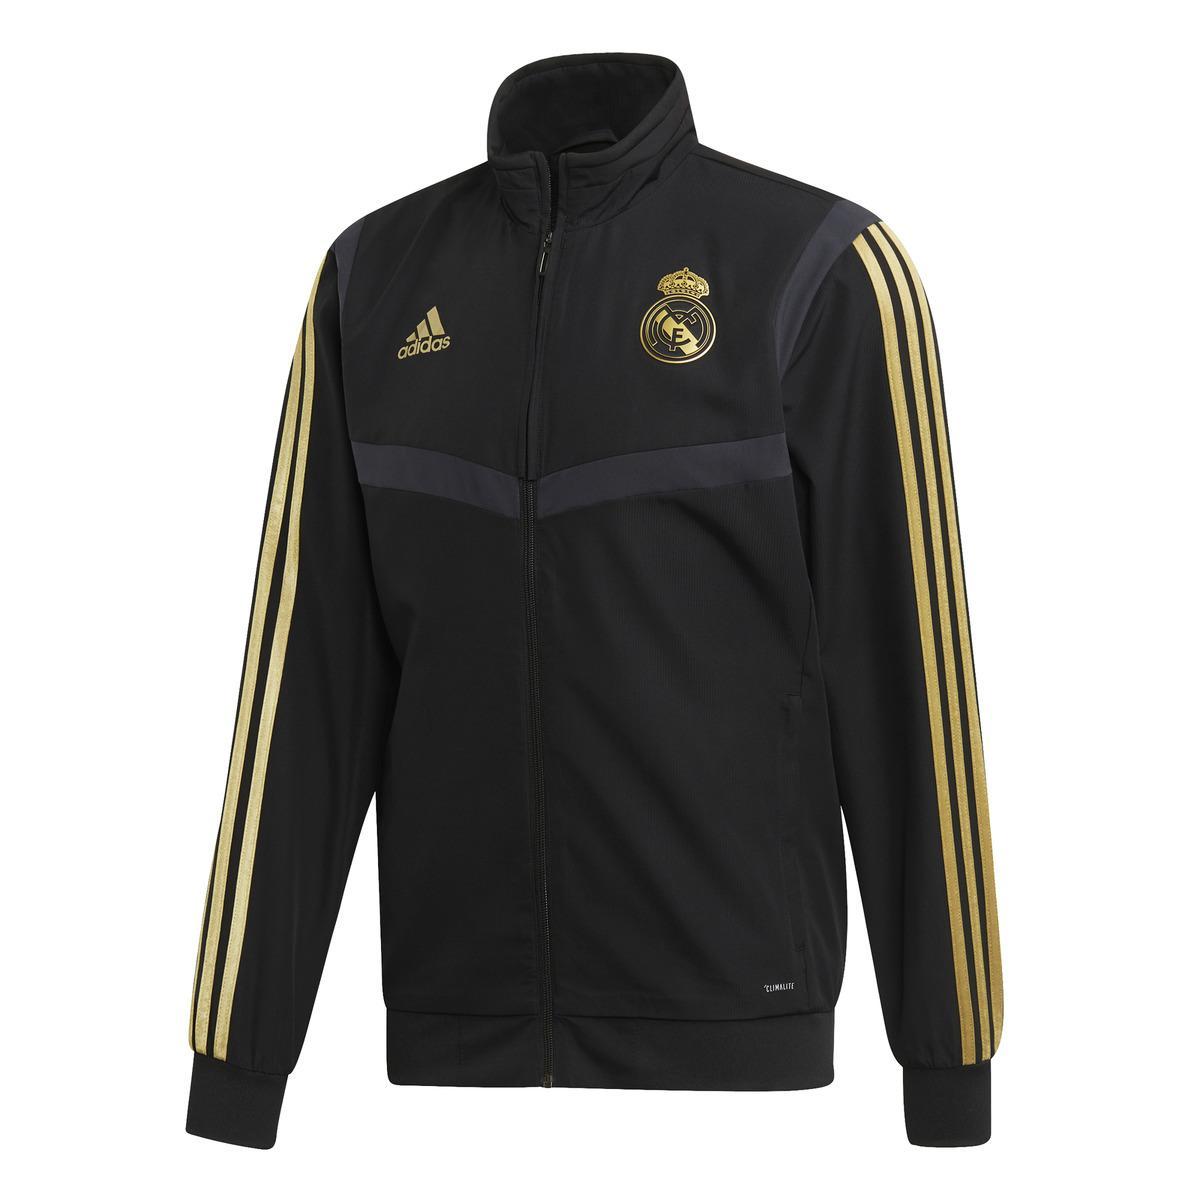 Real Madrid Cf 2019 2020 Presentation Jacket